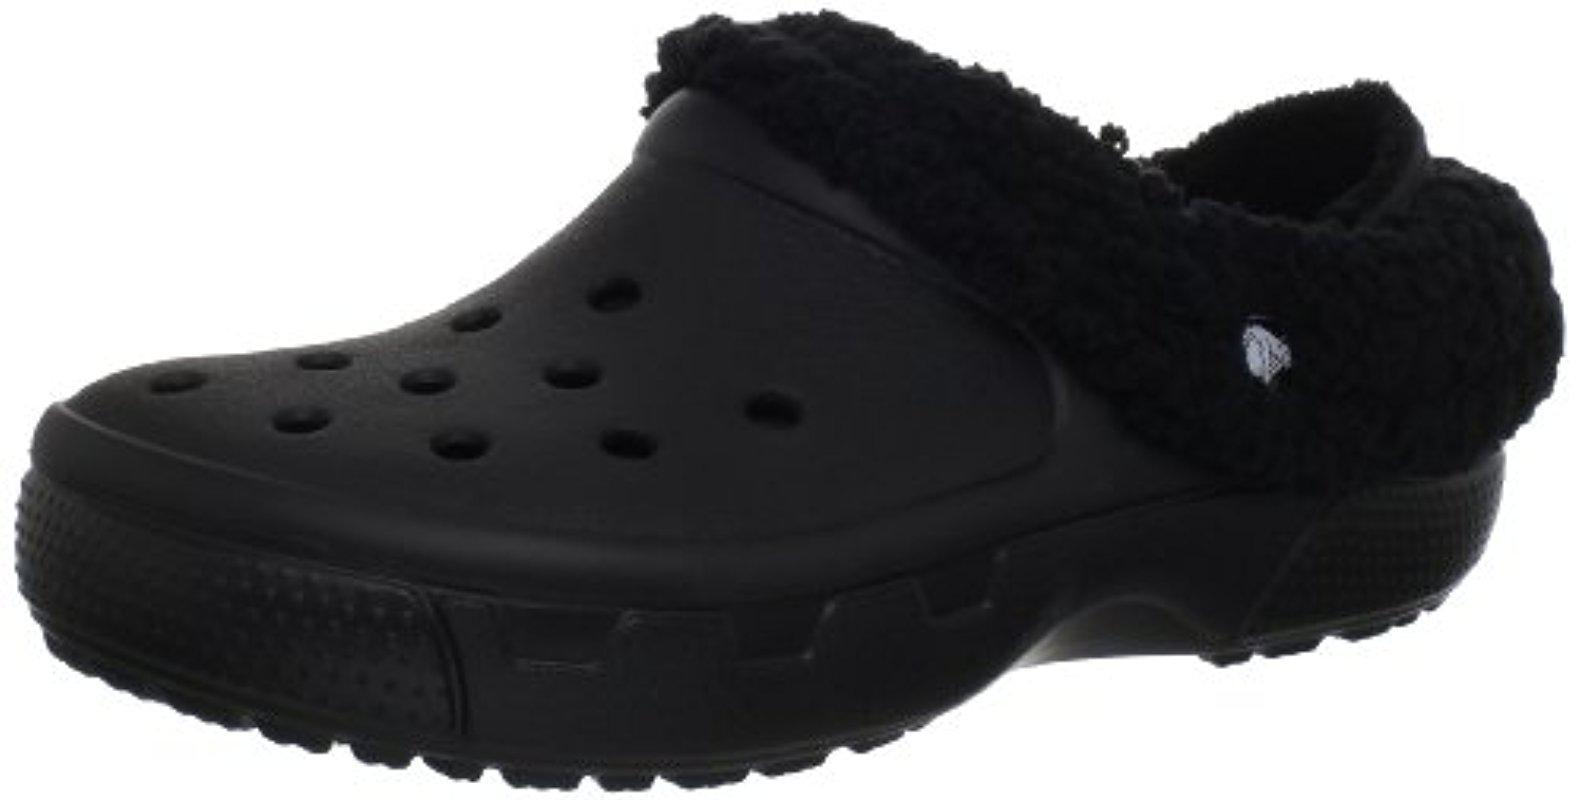 624aa23f559cdb Lyst - Crocs™ Unisex Mammoth Evo Lined Clog in Black